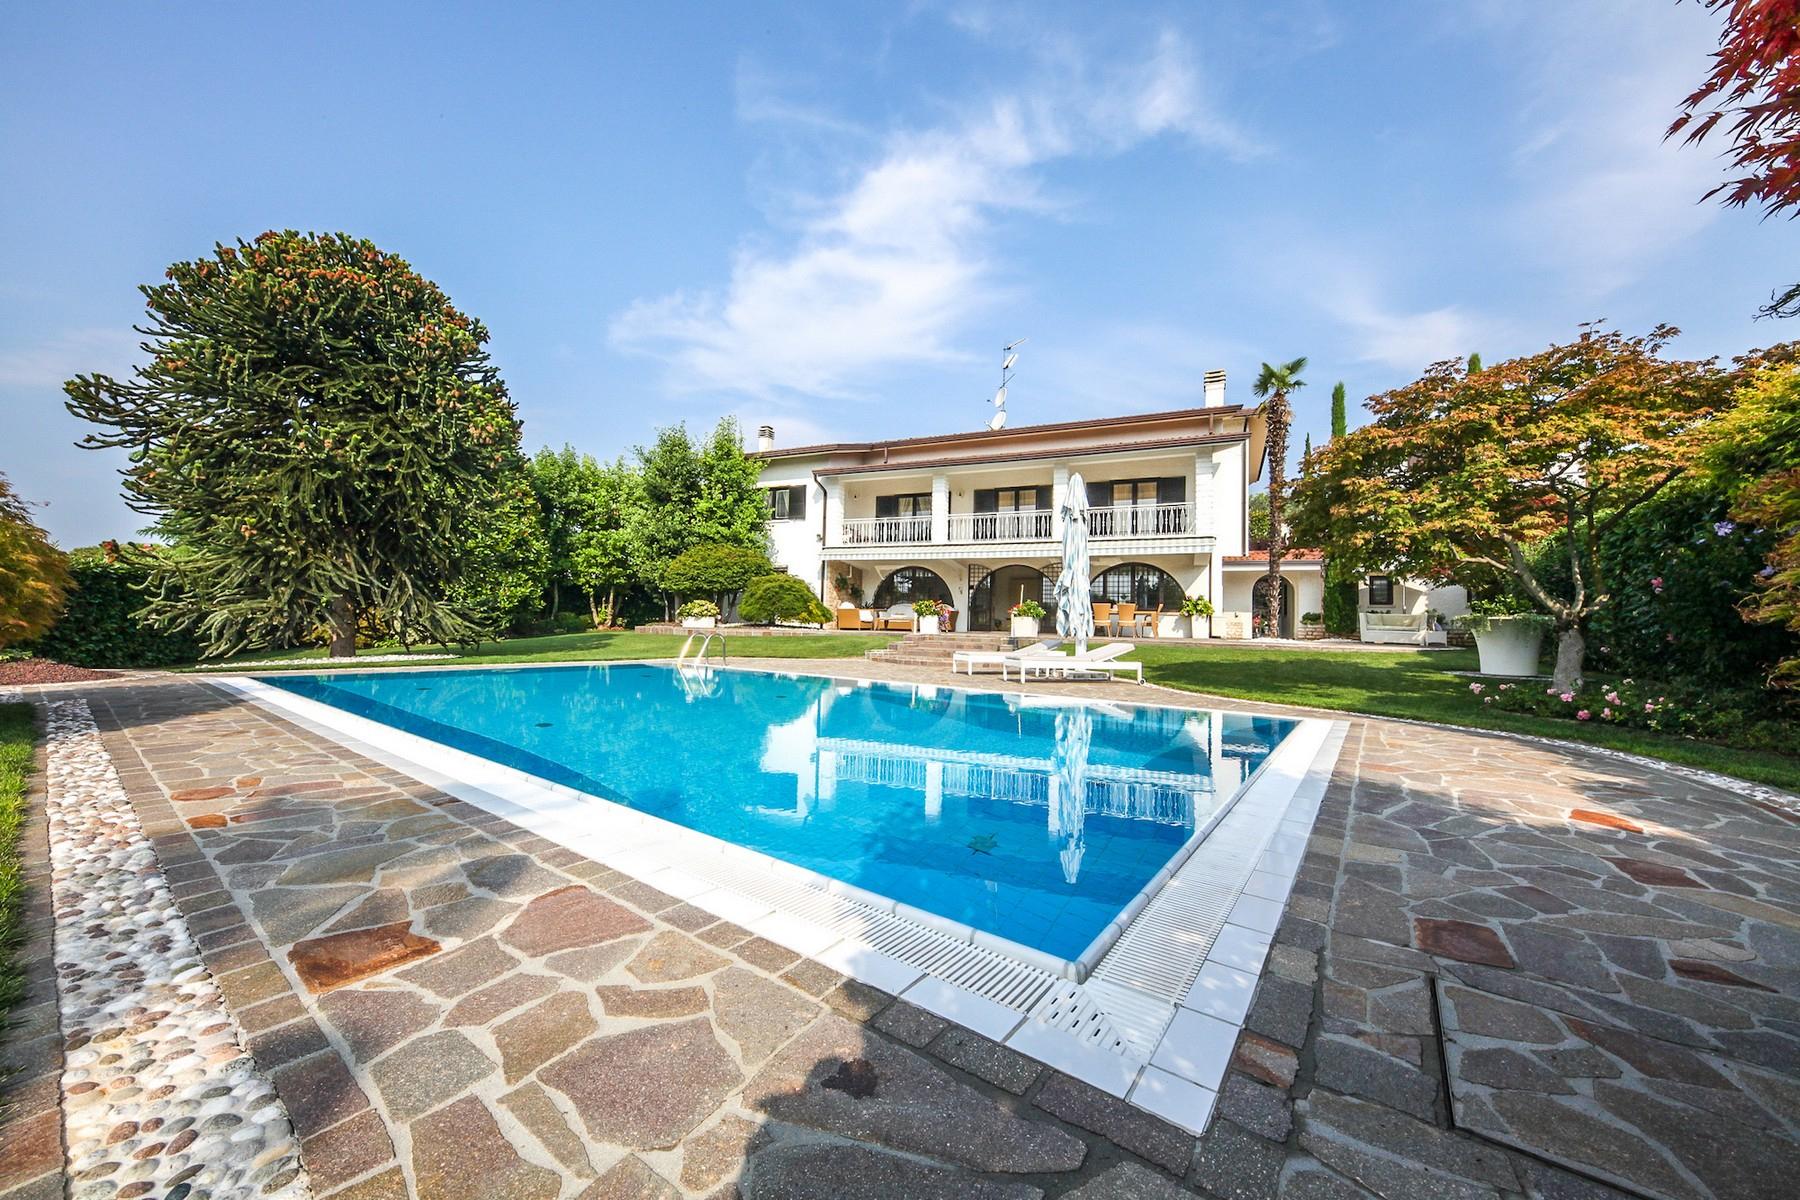 Villa in Vendita a Padenghe Sul Garda: 5 locali, 330 mq - Foto 13